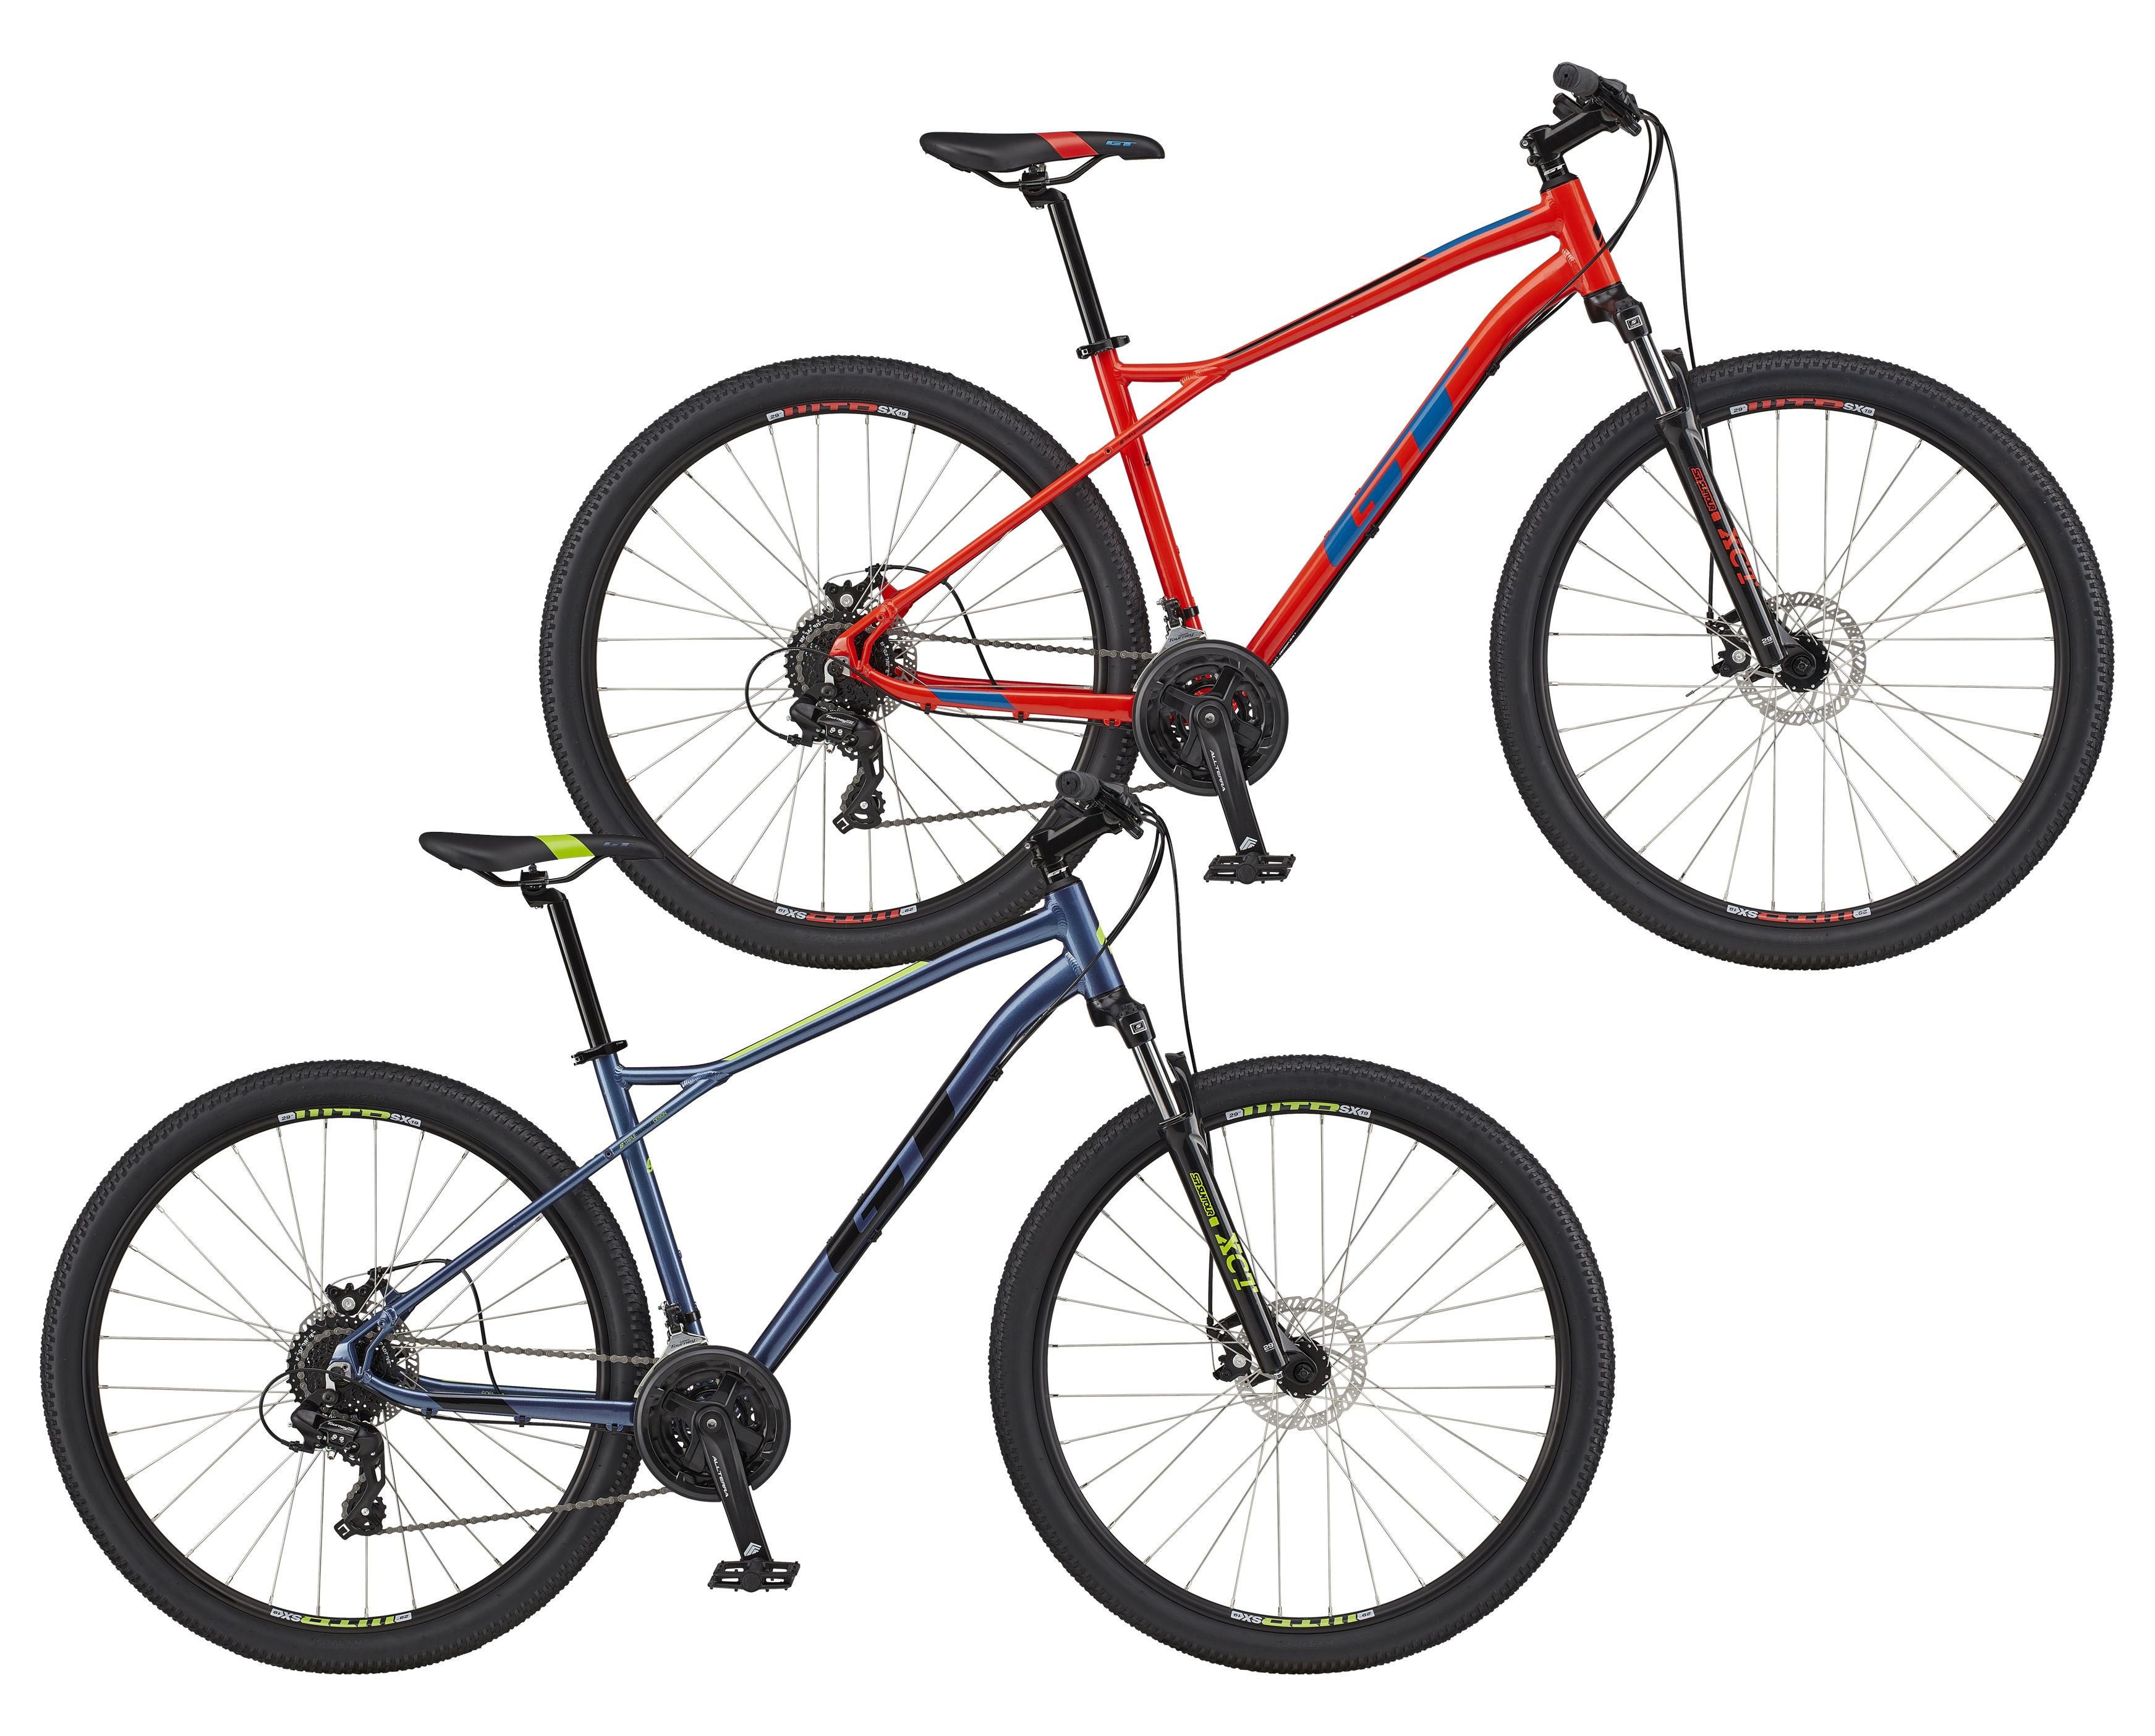 Gt Aggressor Comp Mountain Bike 2020 | Mountainbikes